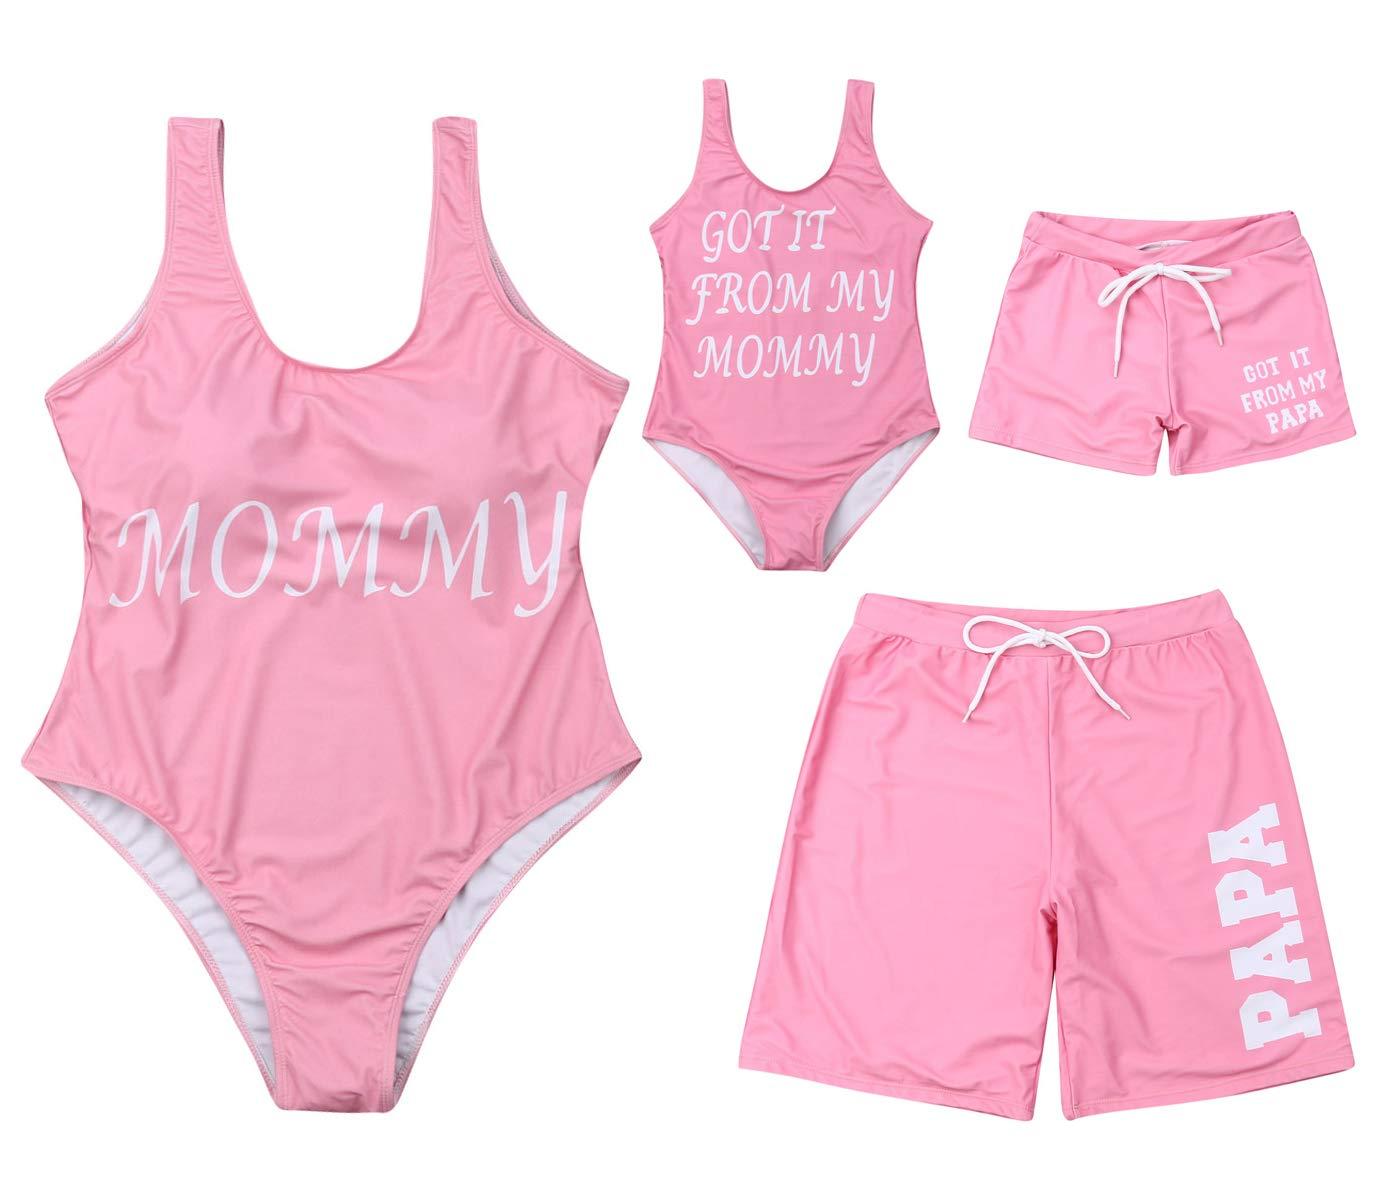 Family Matching Beachwear Mommy&GOT IT from My Mommy 1-Piece Swimsuit PAPA&GOT IT from My PAPA Swim Shorts